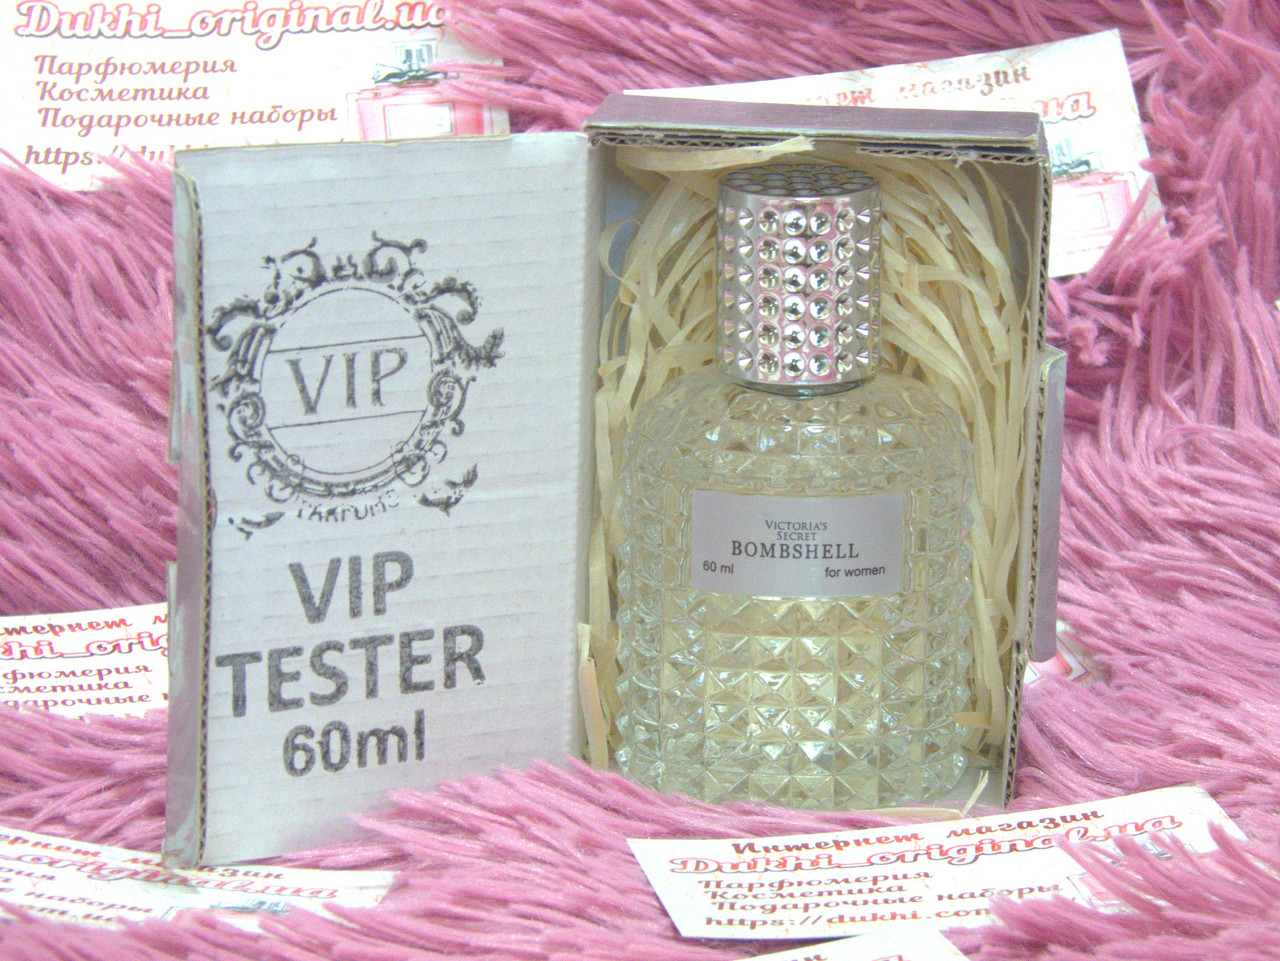 Парфюм женский Victoria's Secret Bombshell 60 ml TESTER